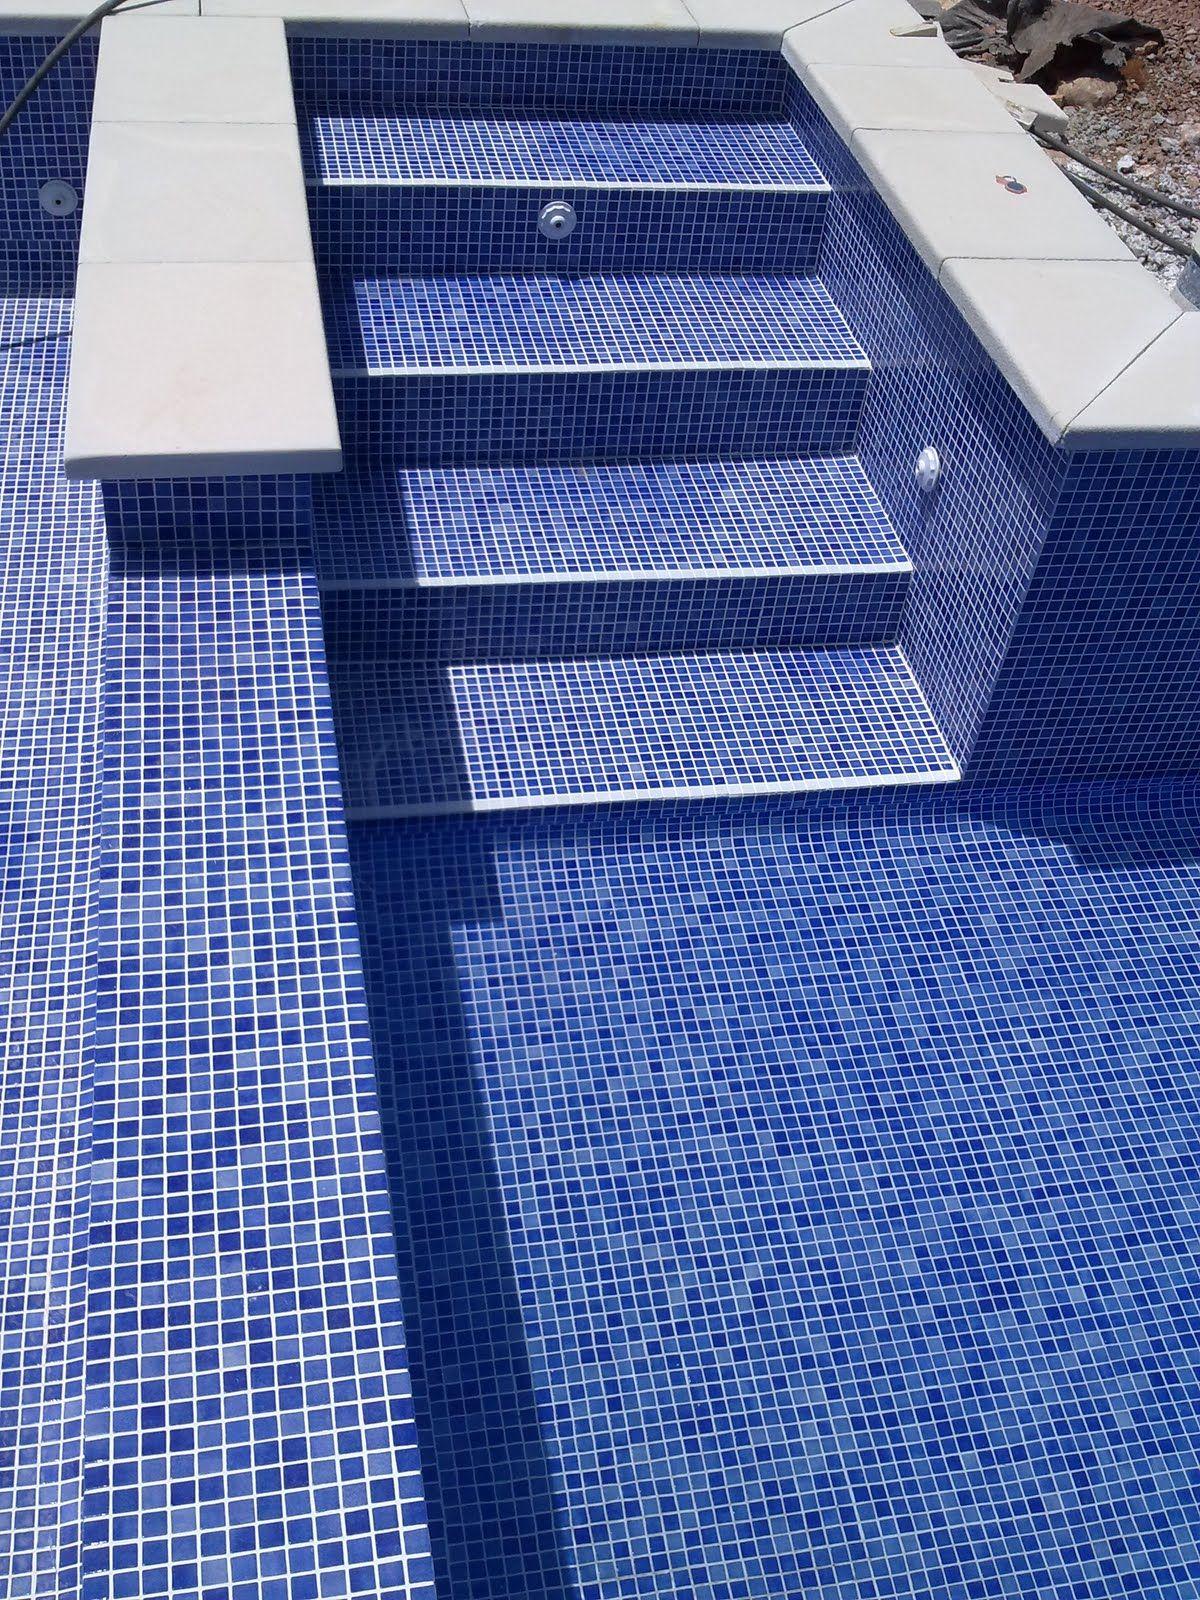 Gresite piscinas buscar con google pool pinterest for Colores de gresite